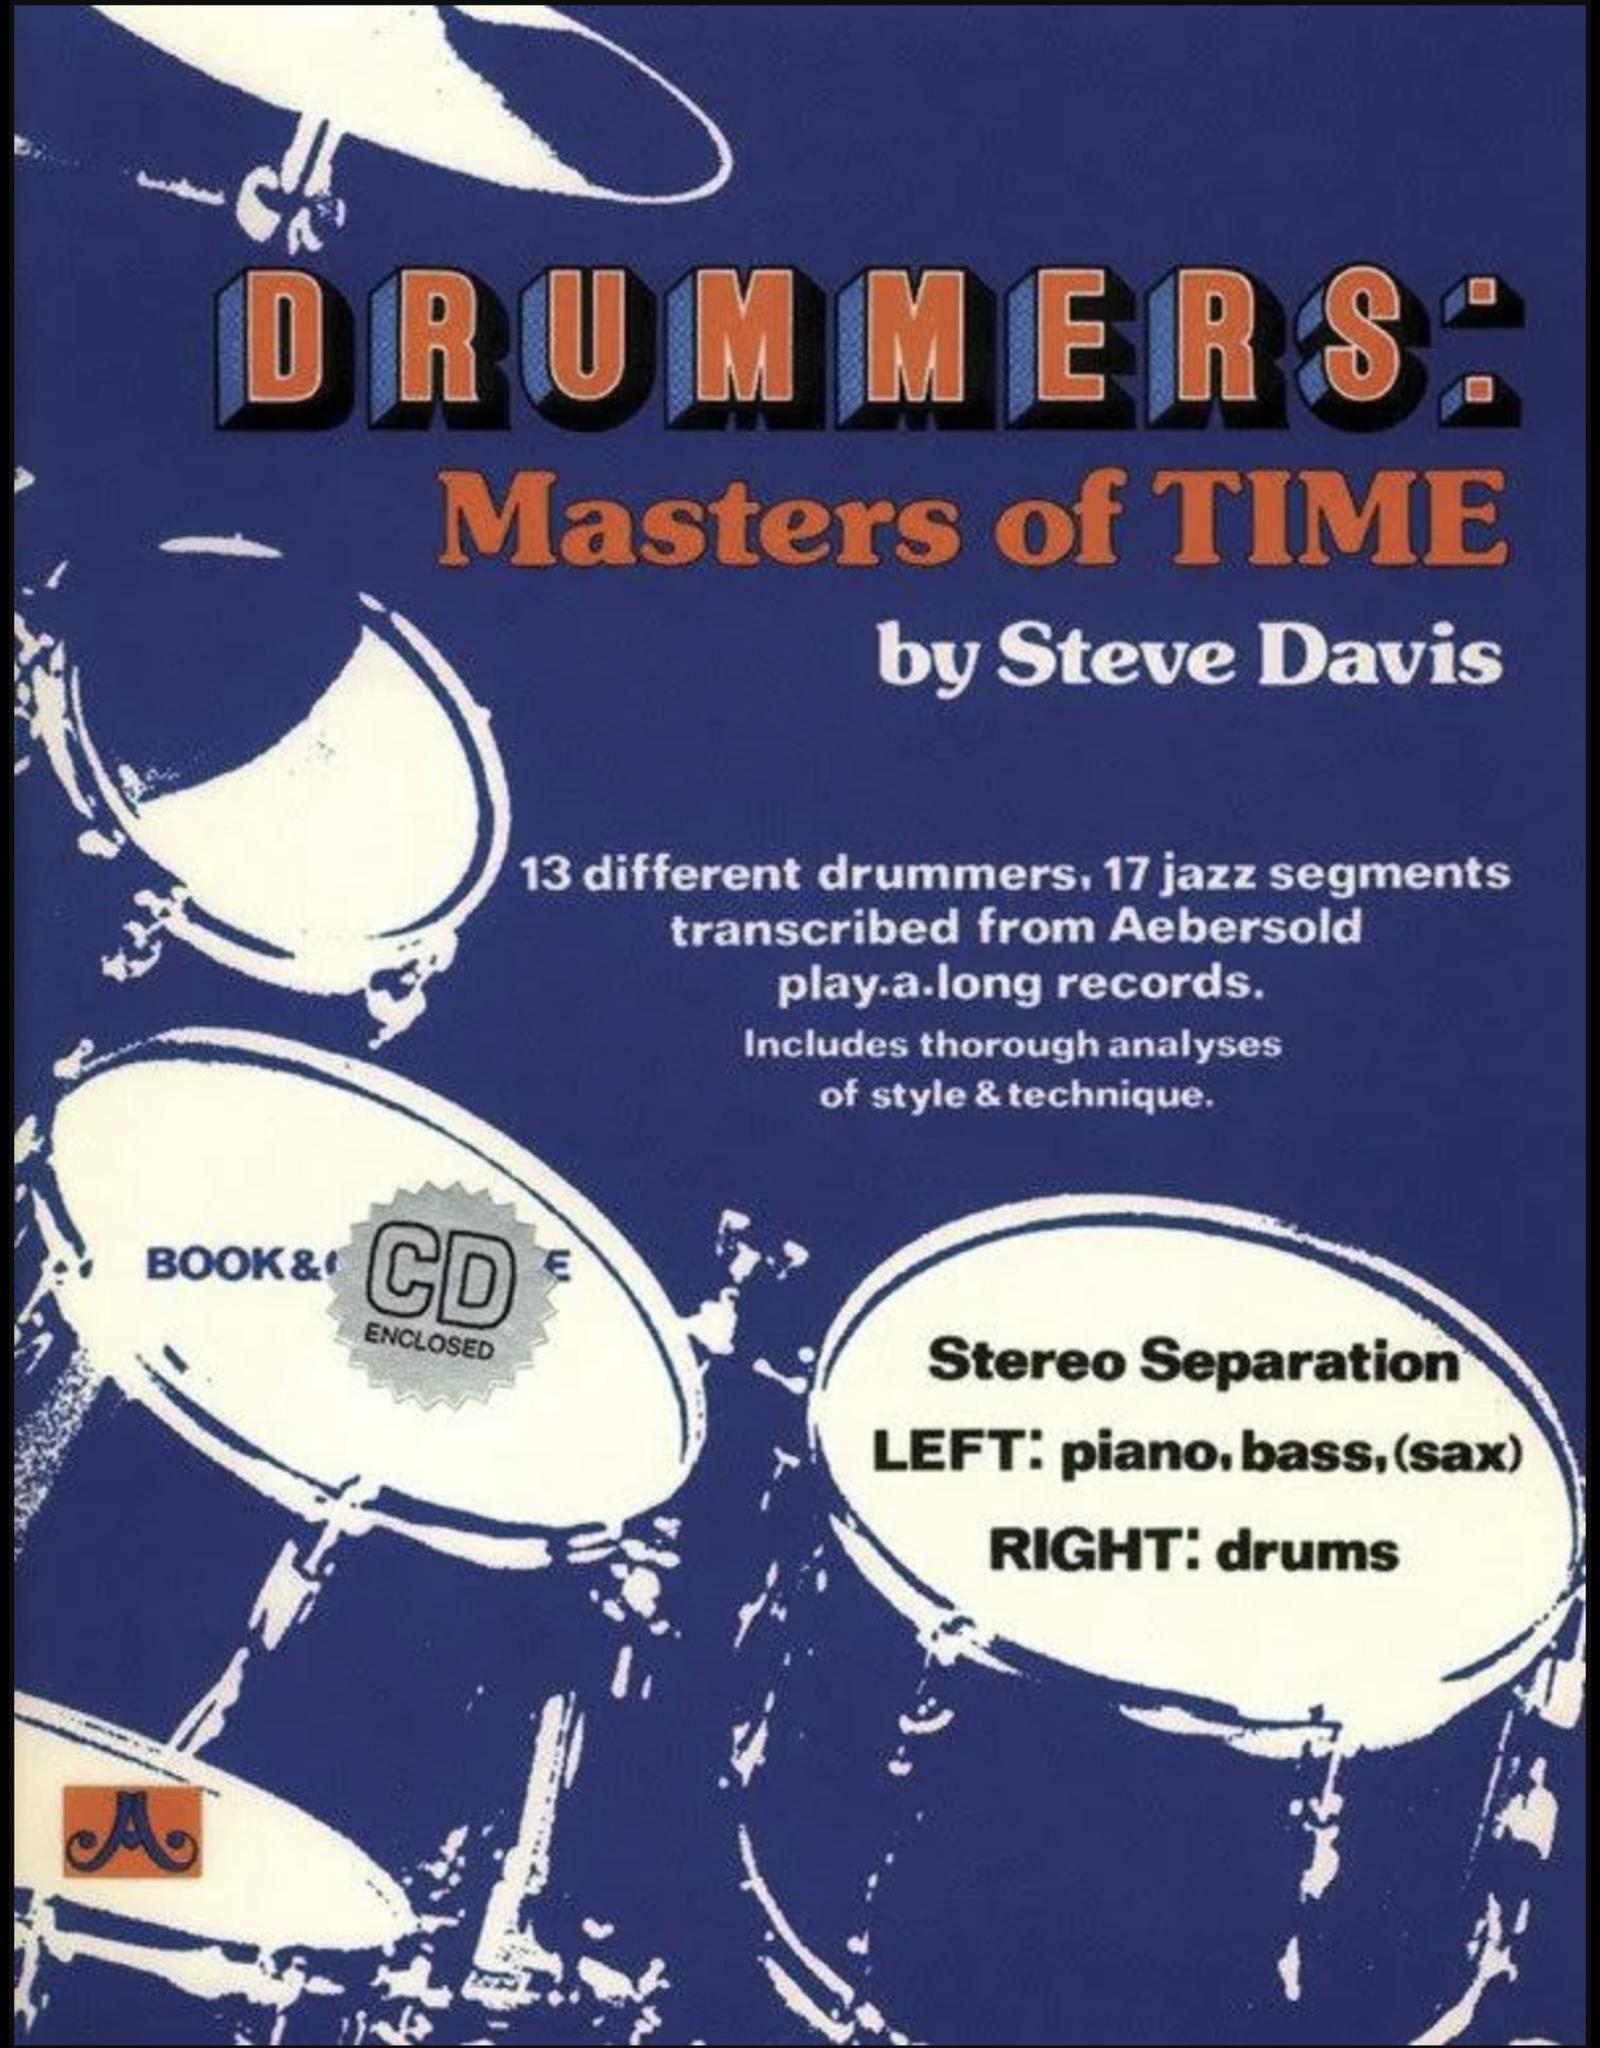 Aebersold Jazz Jazz Drummers: Masters Of Time by Steve Davis